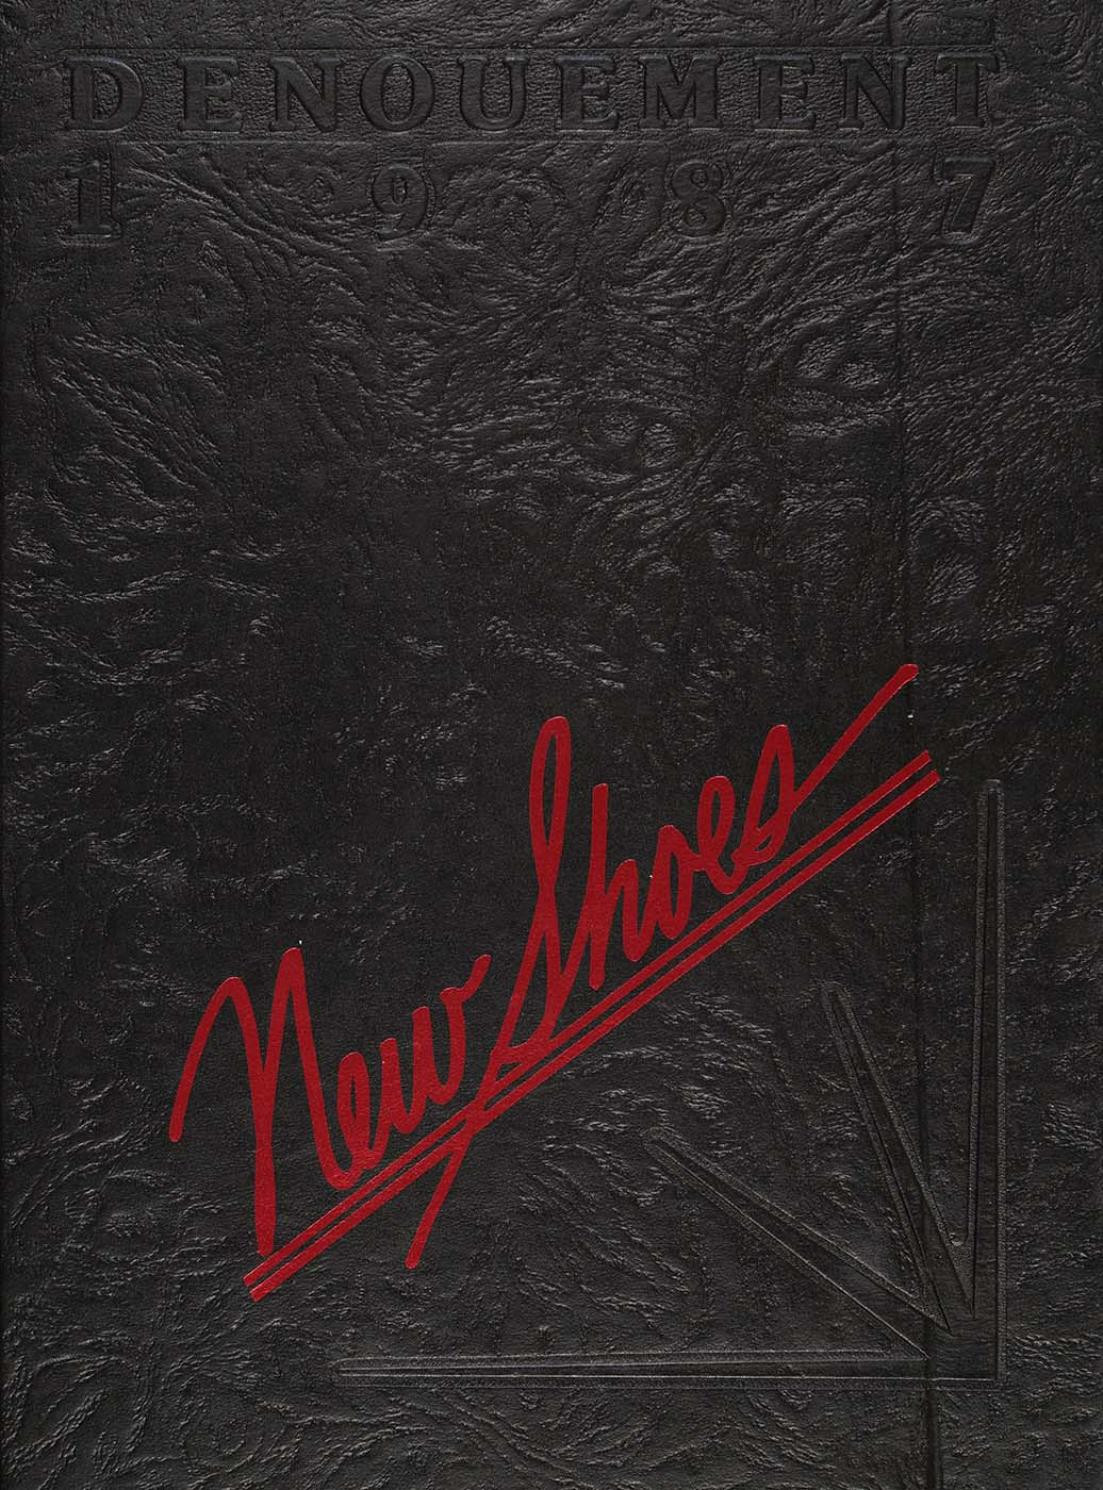 ace hardwood flooring smithfield ri of danouement 1987 yearbook by rhode island college digitial inside danouement 1987 yearbook by rhode island college digitial initiatives issuu